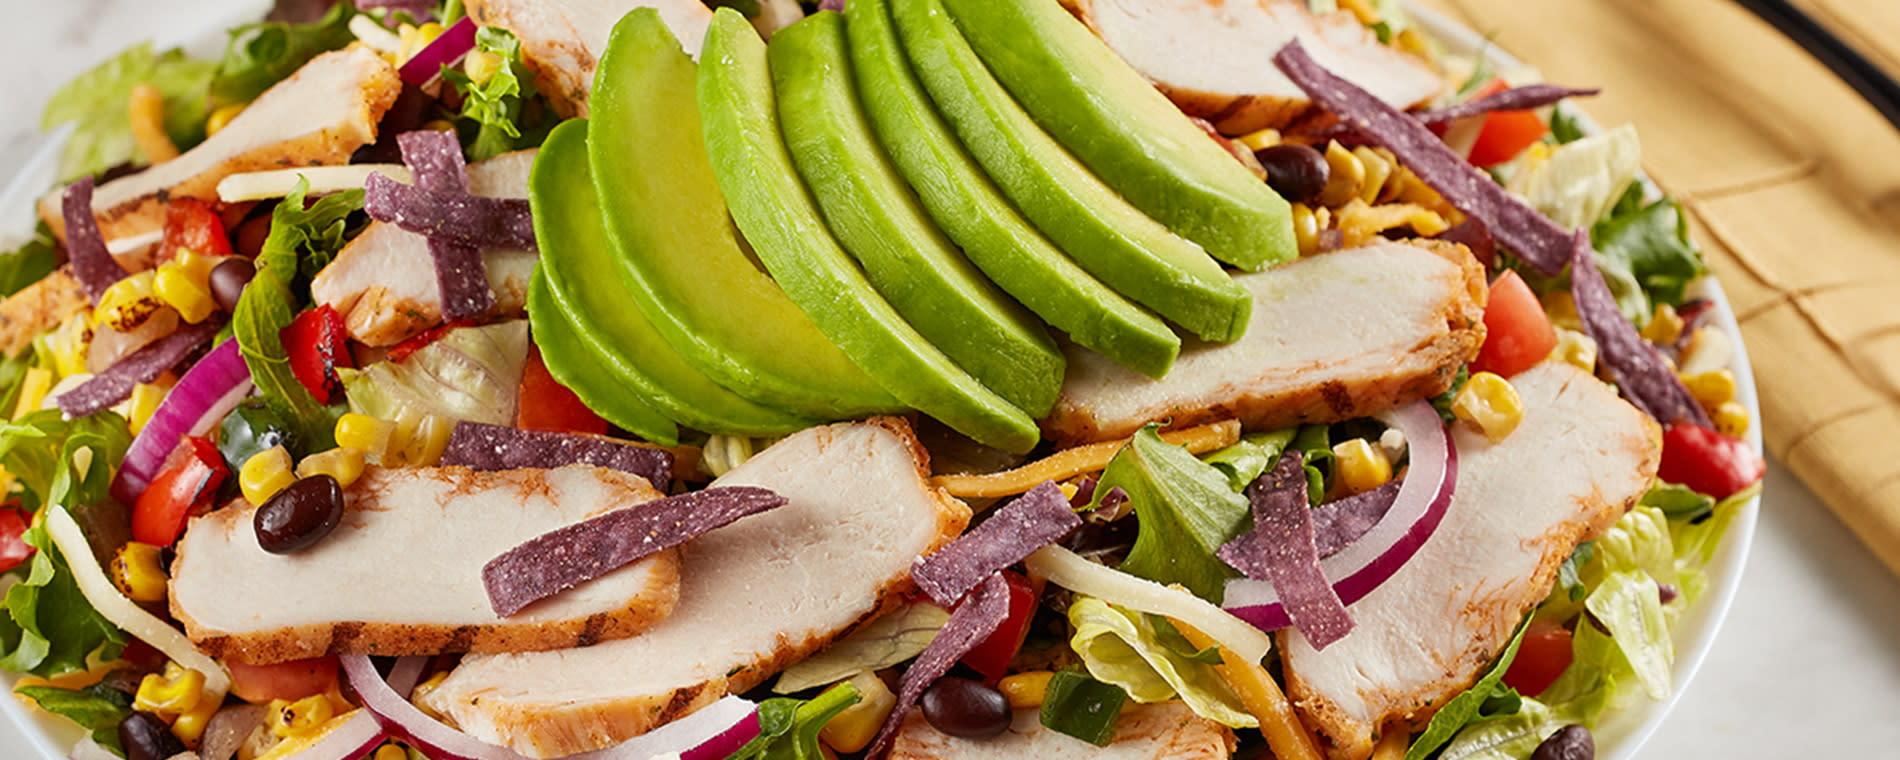 McAlisters Southwest Salad